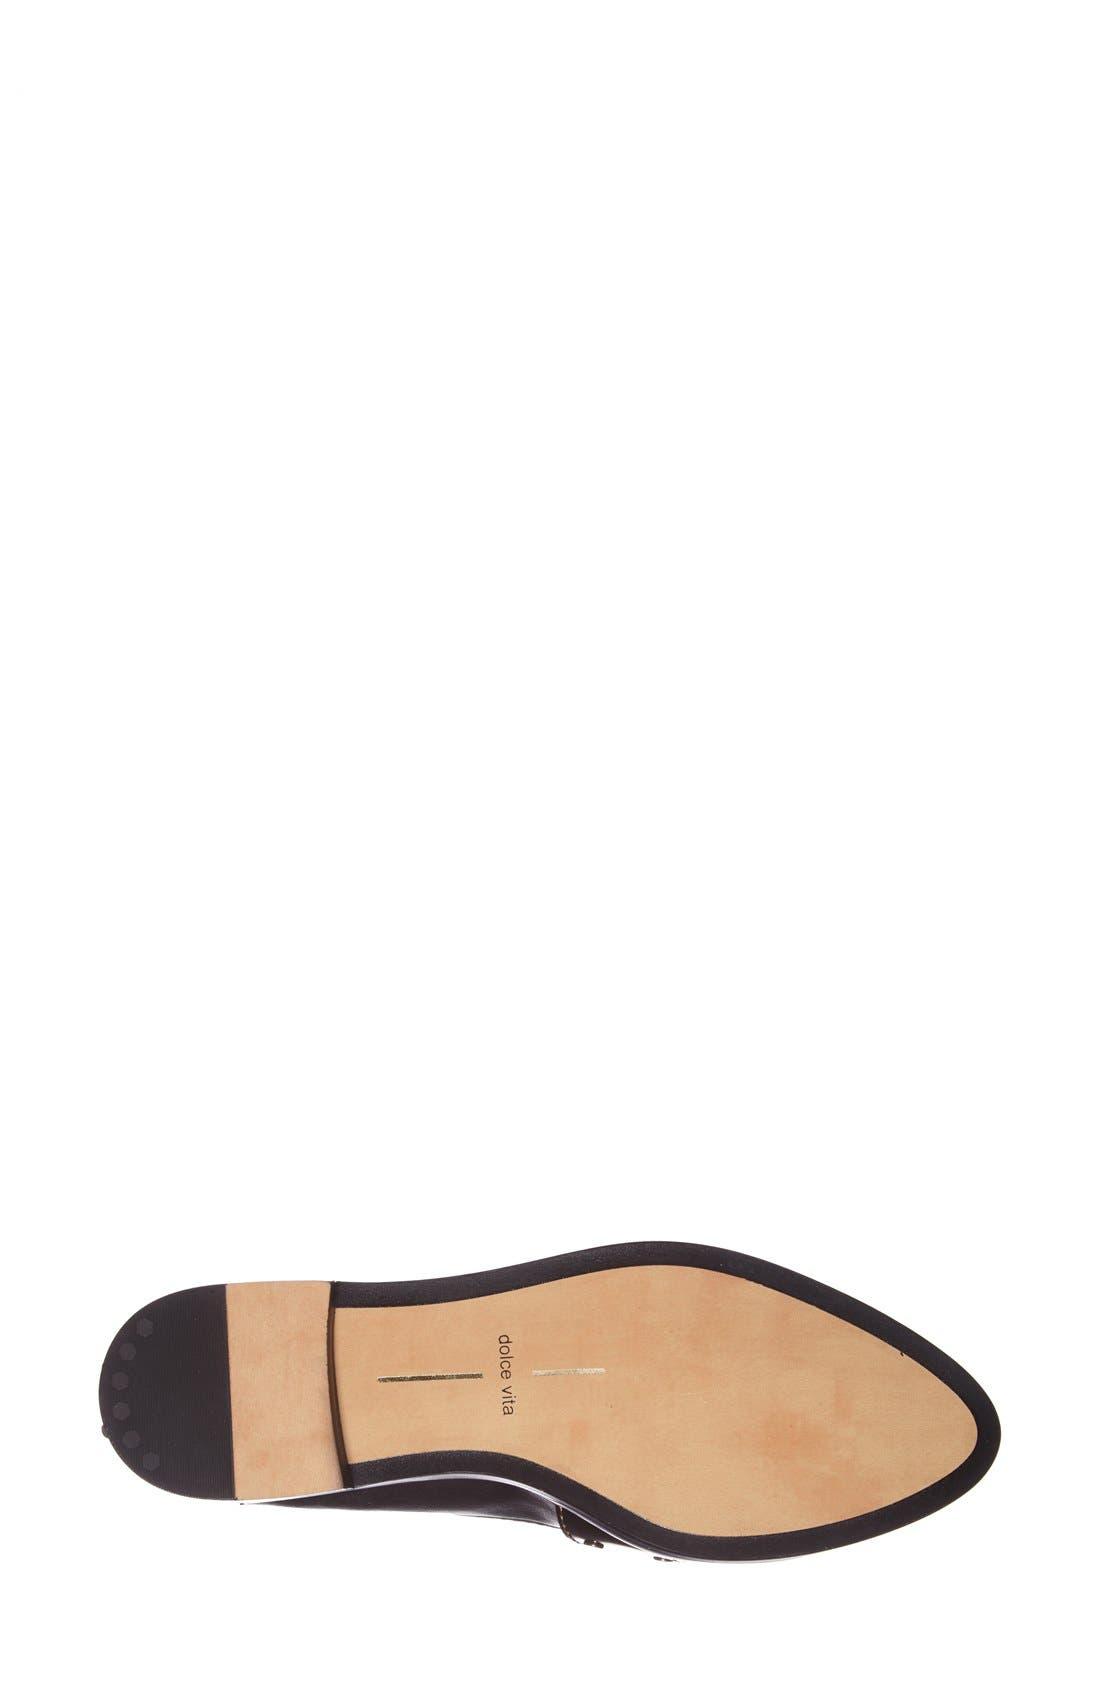 Alternate Image 4  - Dolce Vita 'Umbria' Loafer (Women)